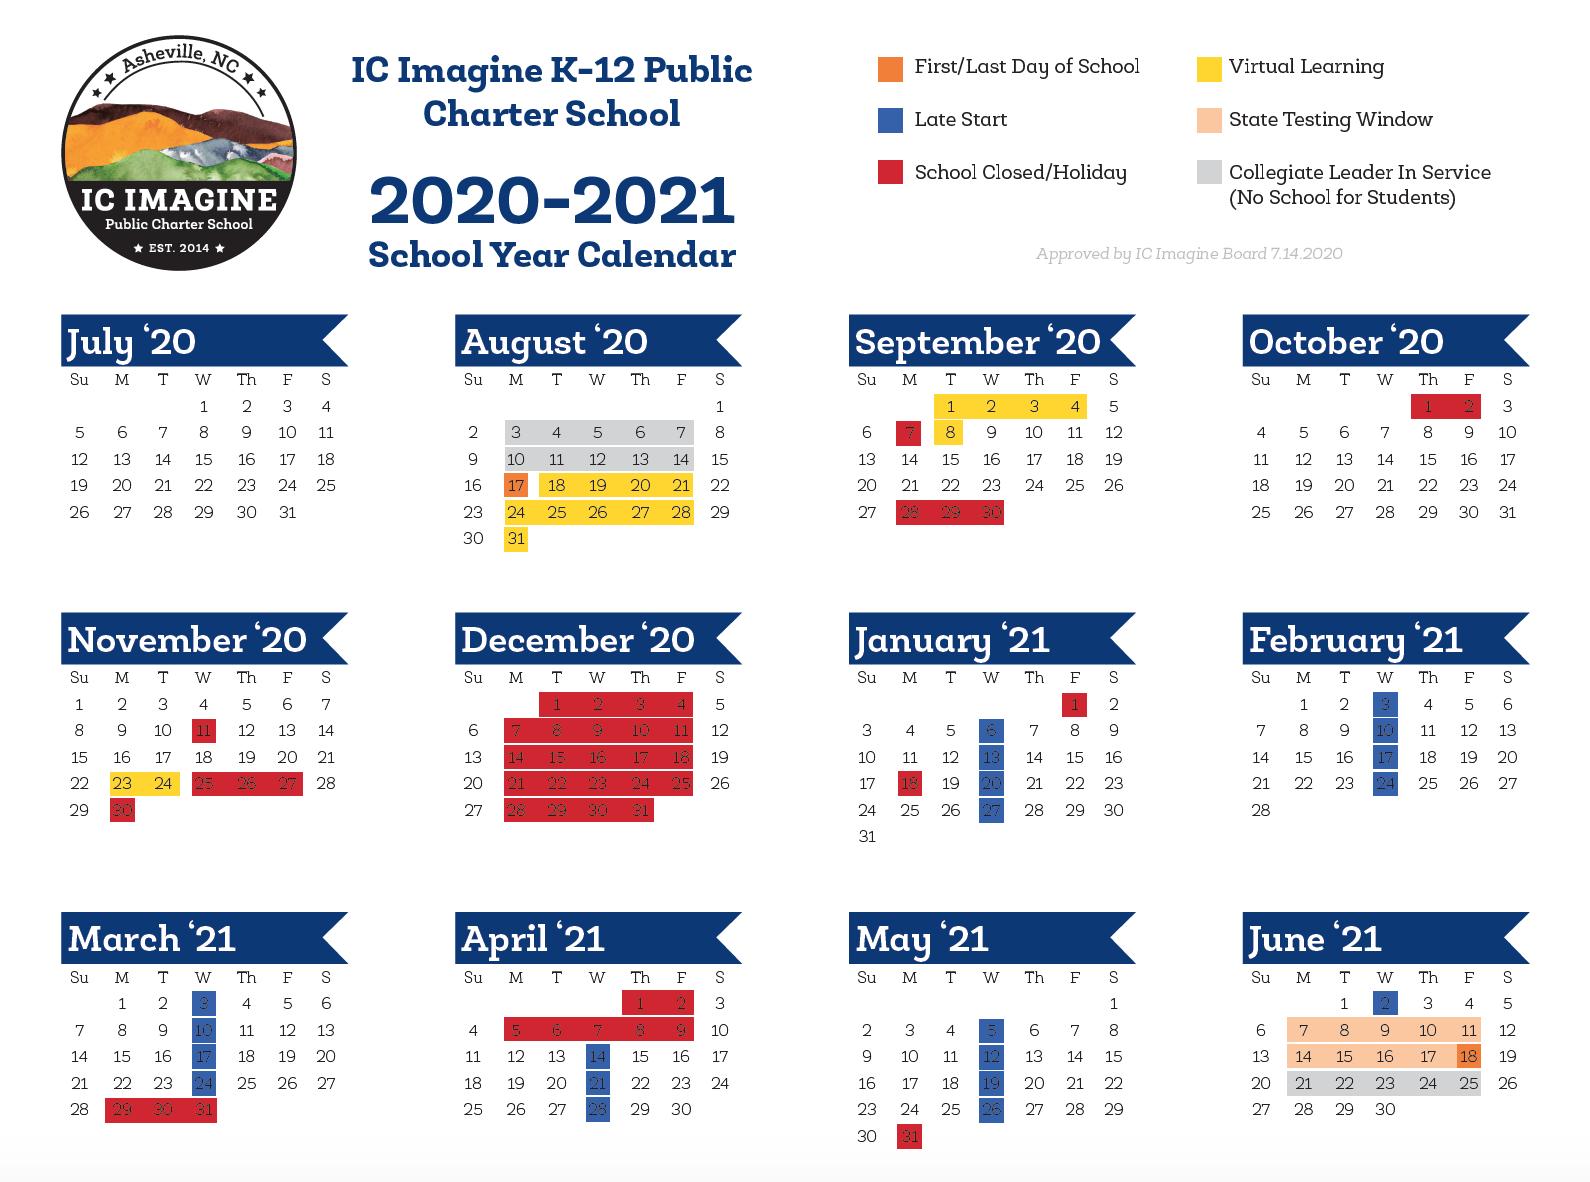 Buncombe County Schools Calendar 2022.School Year Calendar Ic Imagine A Public Charter School